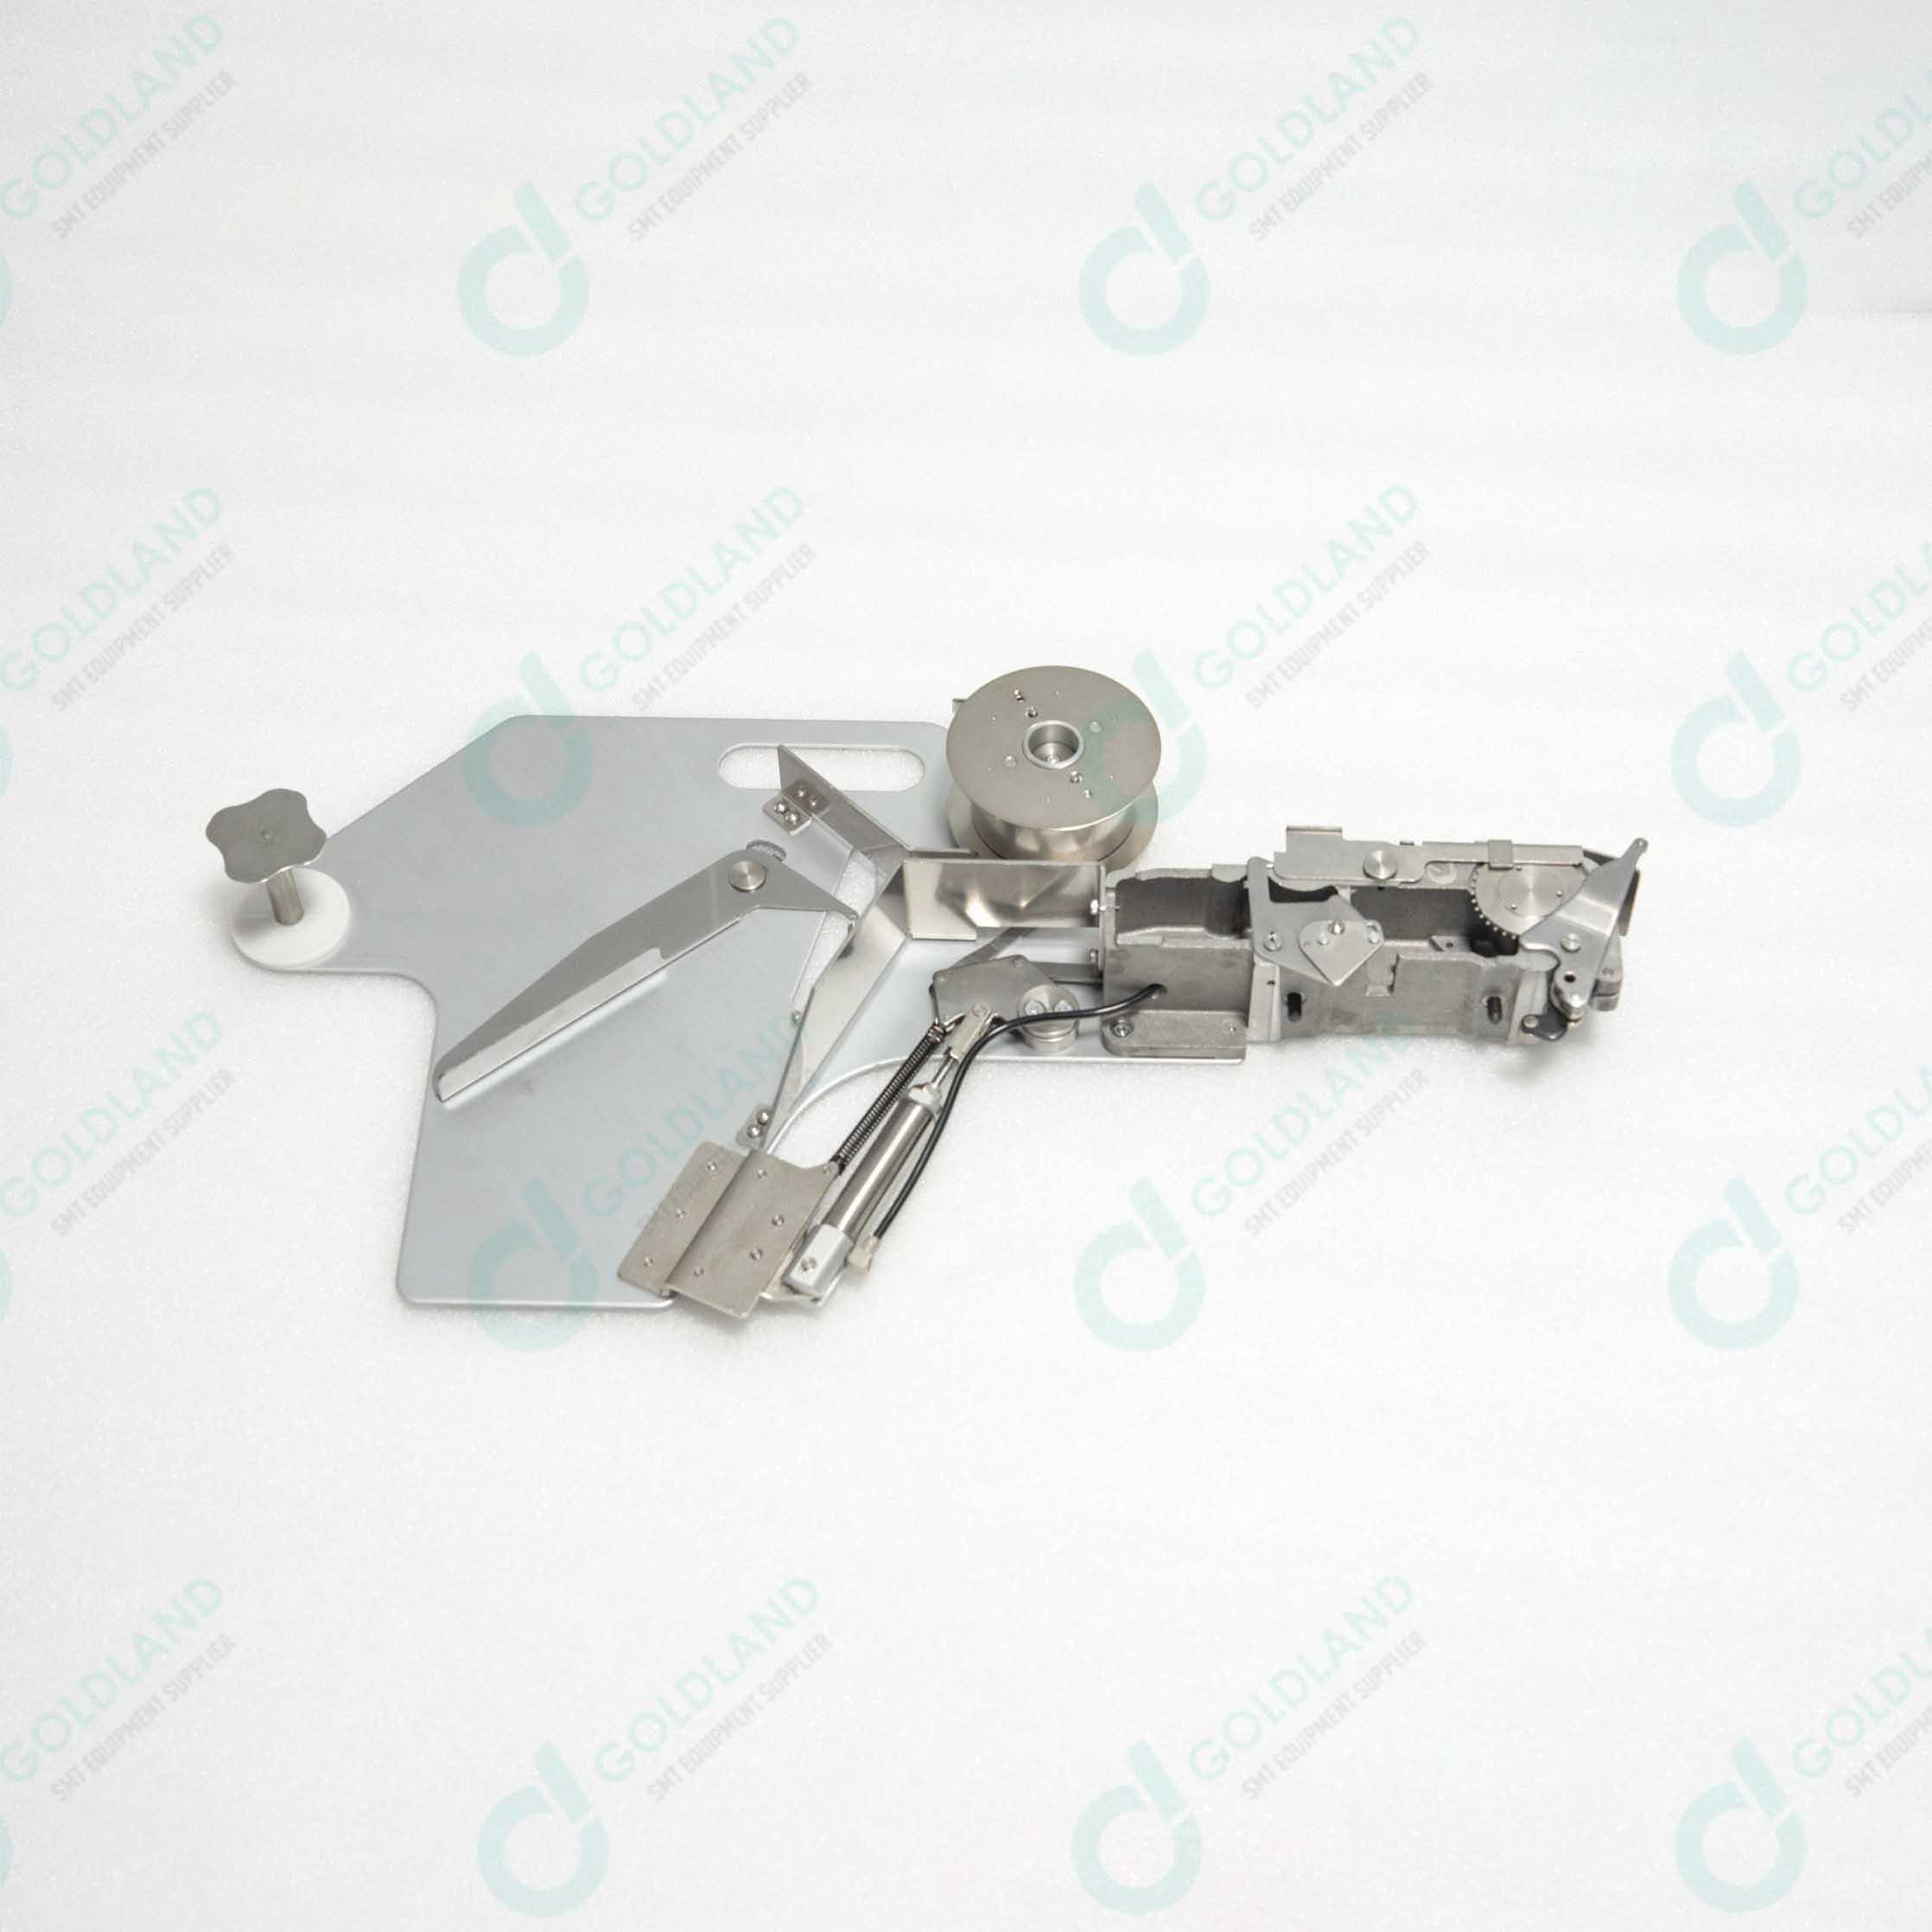 YAMAHA smt machine parts KW1-M6500-030 YAMAHA CL 44mm FEEDER